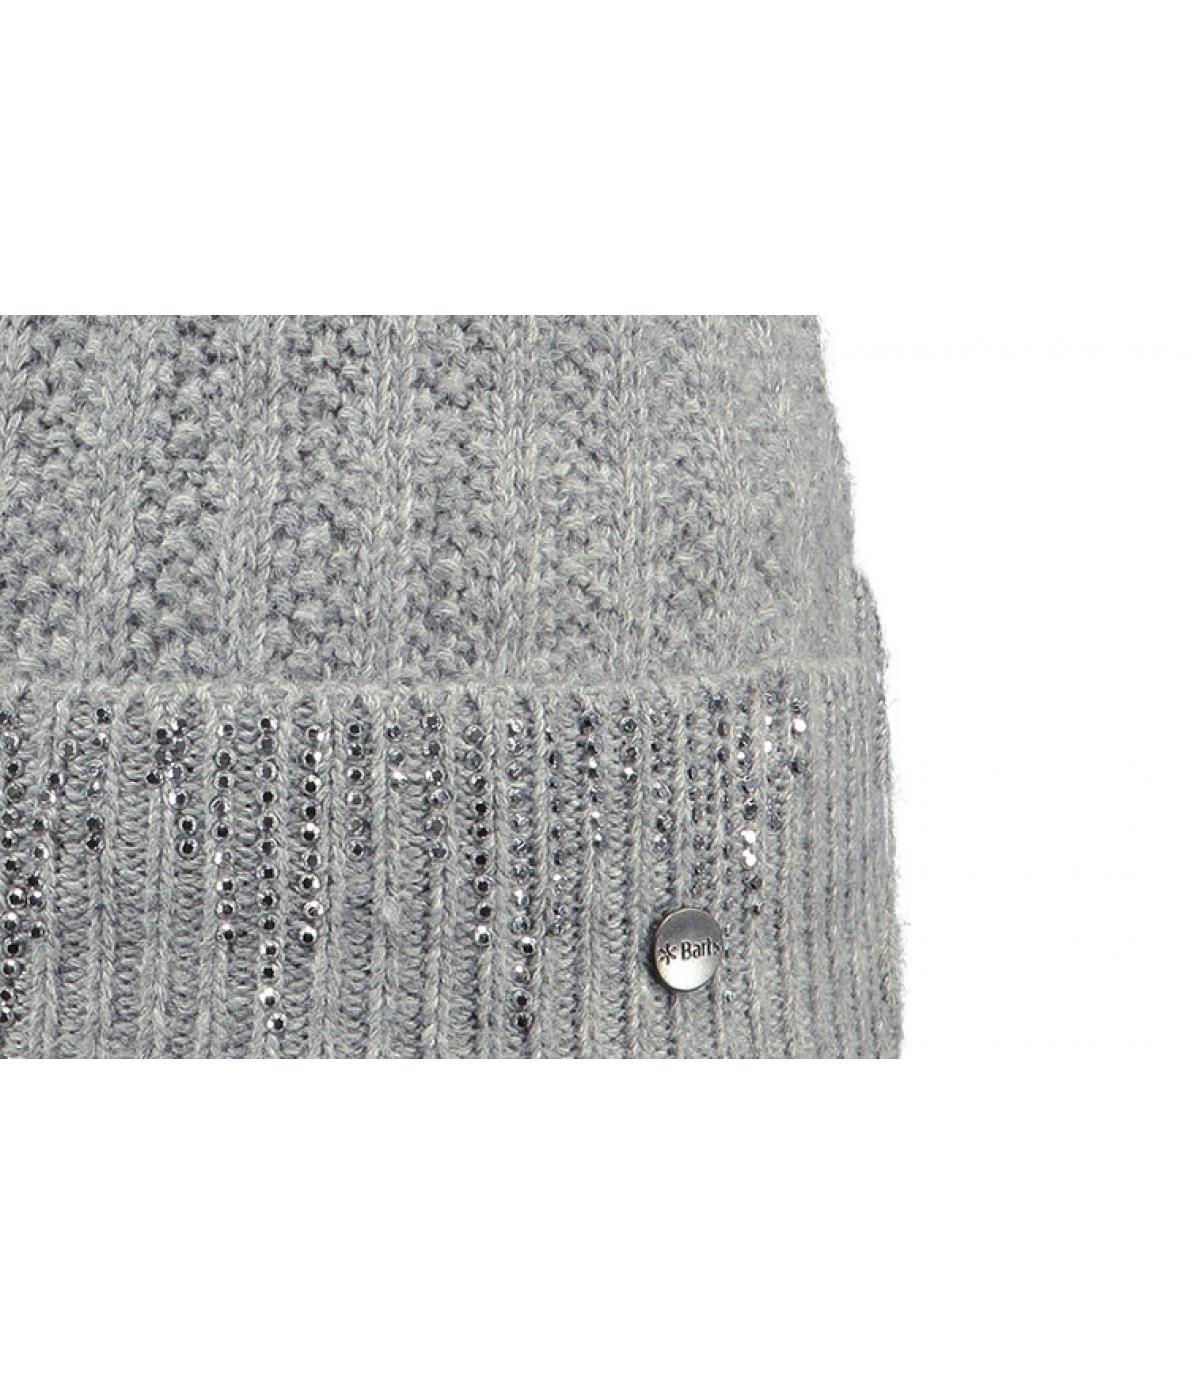 Détails Marigold beanie heather grey - image 3